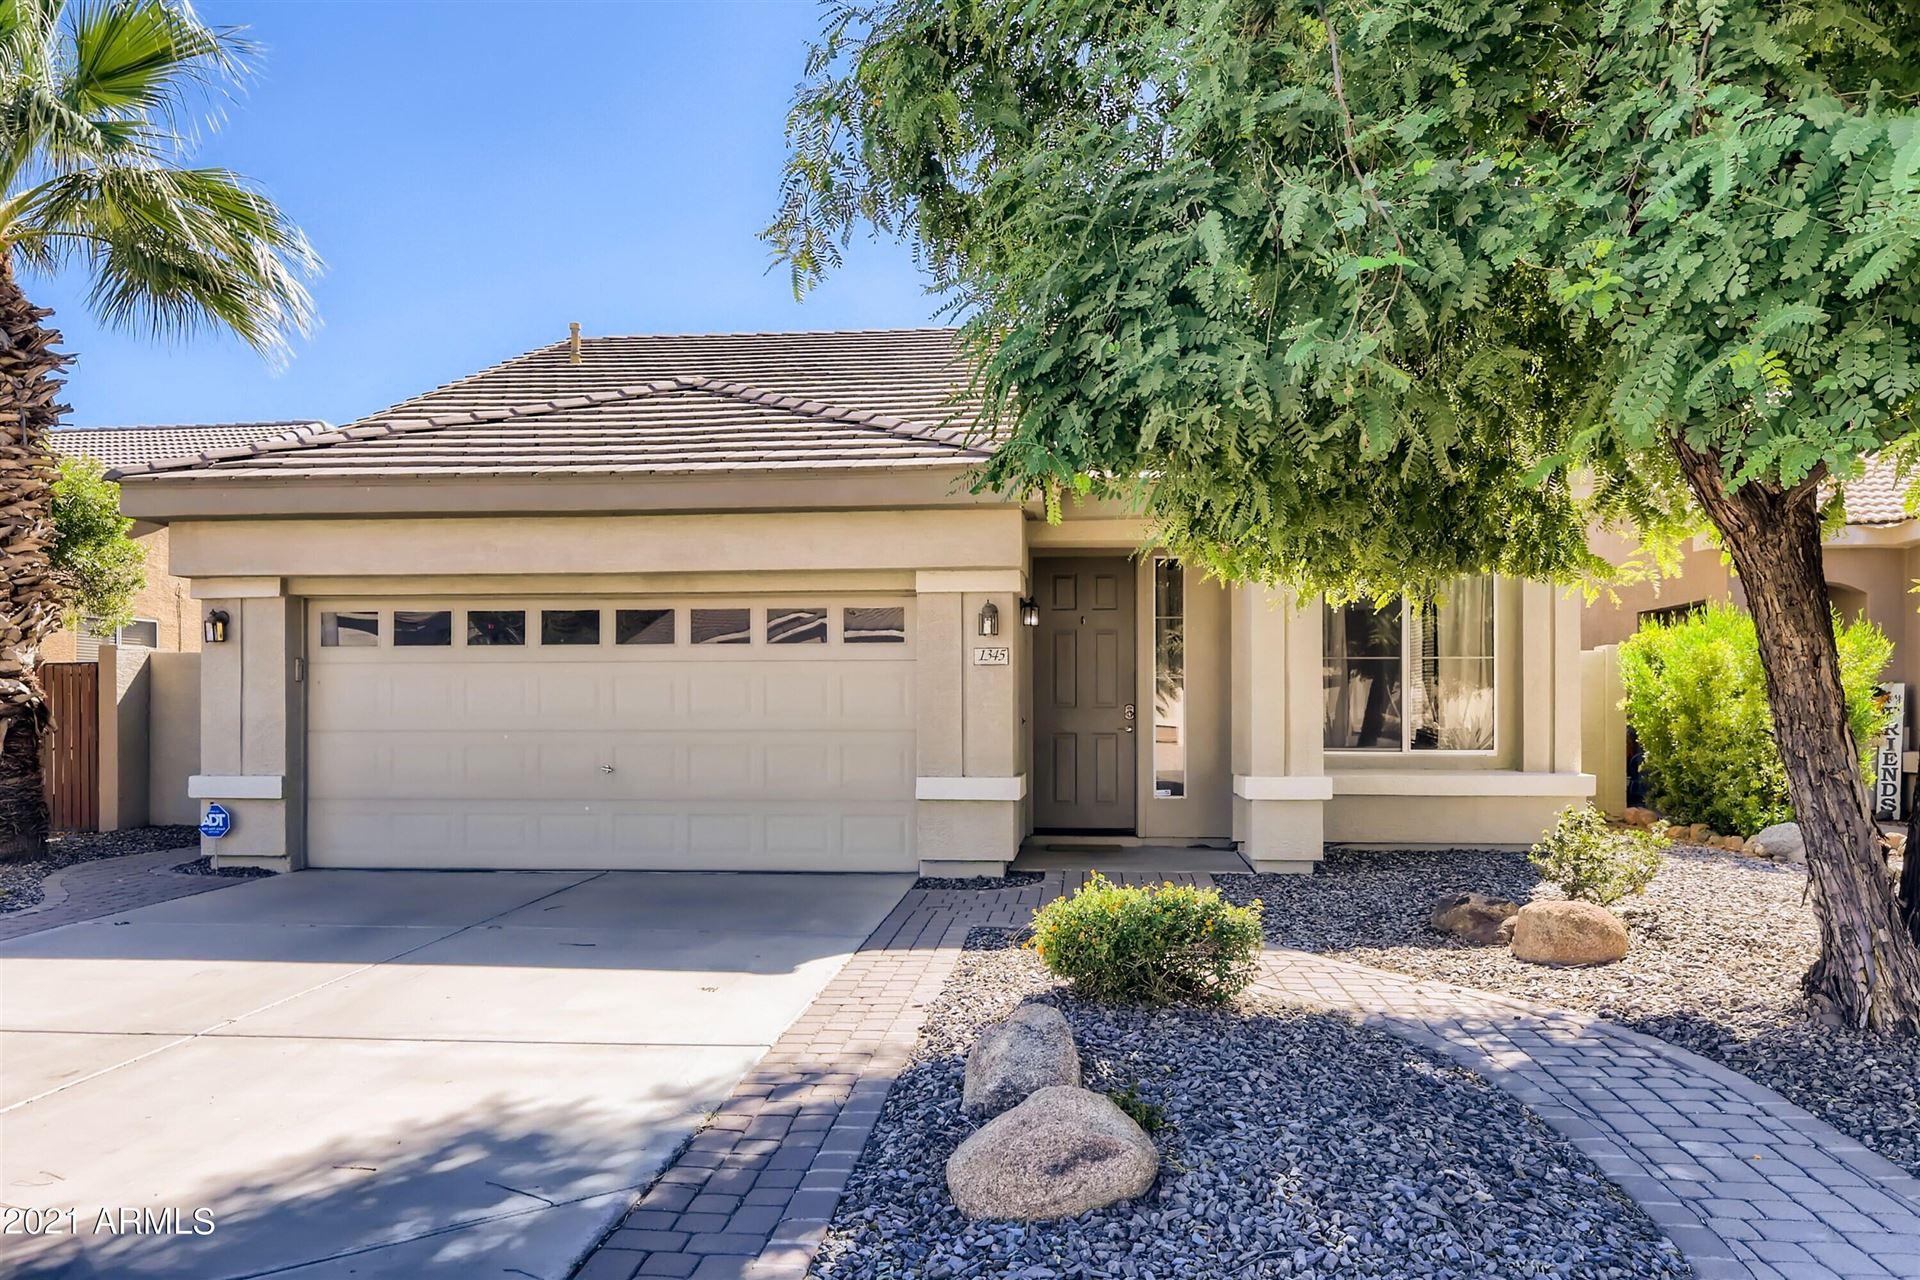 Photo of 1345 W MUSKET Way, Chandler, AZ 85286 (MLS # 6307441)